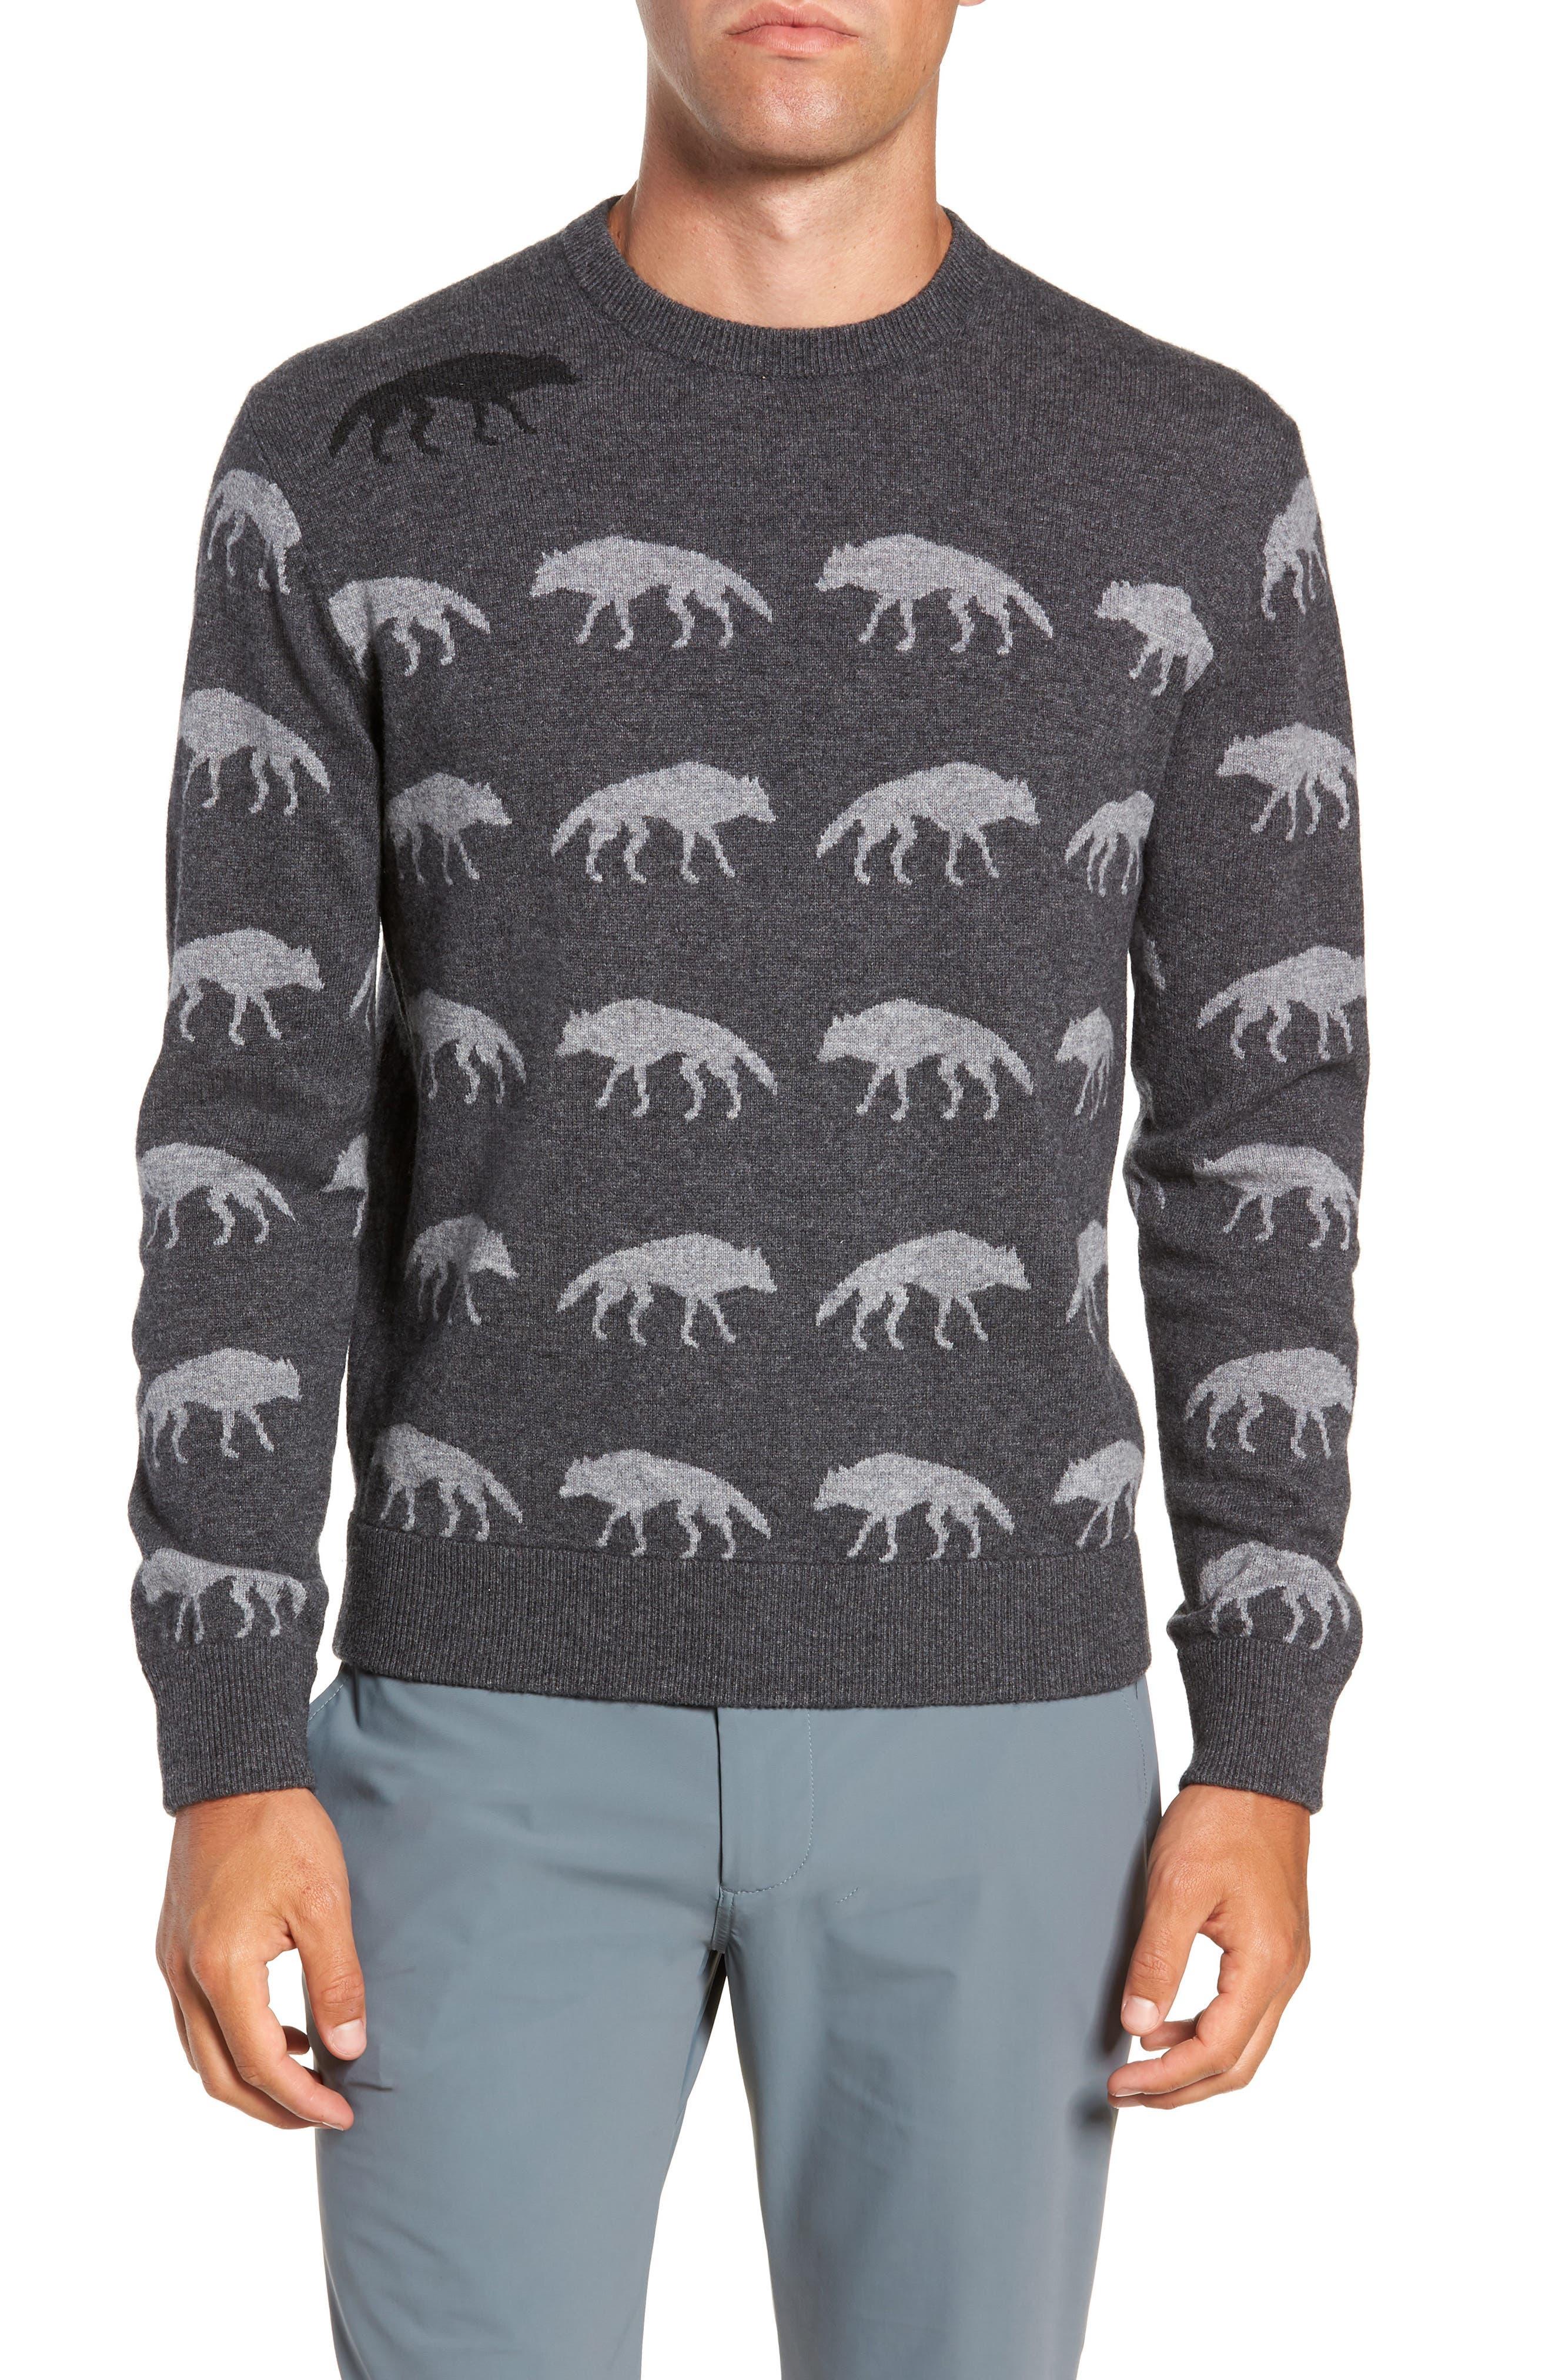 Alphawolf Intarsia Crewneck Sweater,                             Main thumbnail 1, color,                             GREY HEATHER